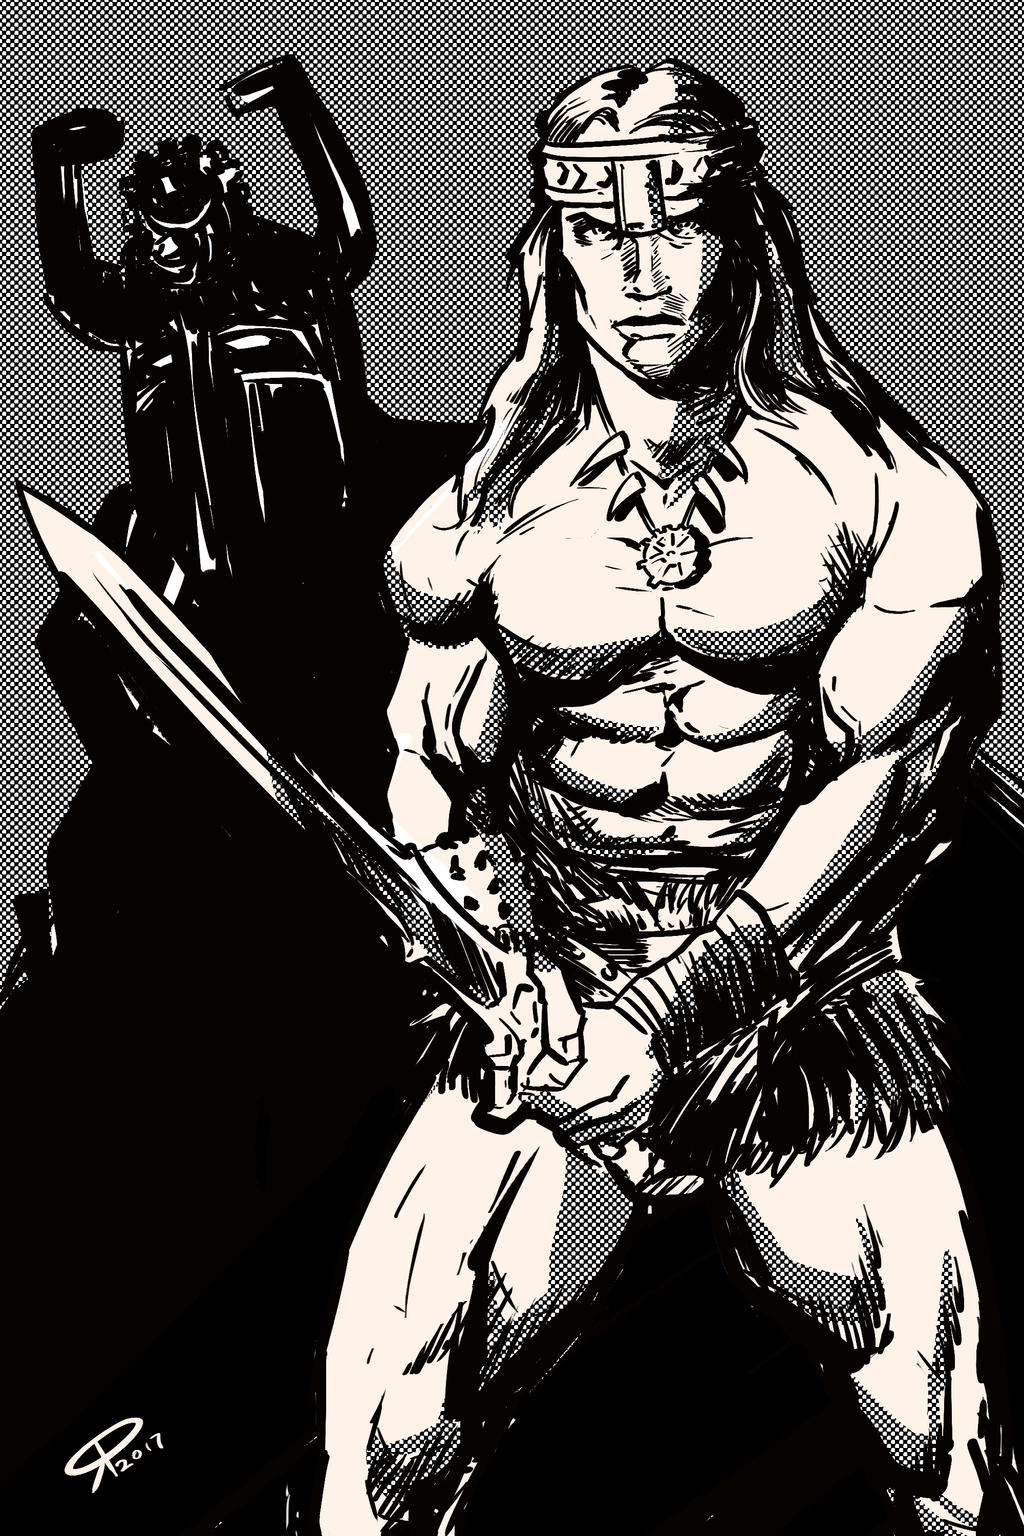 Conan The Barbarian by klaatu81